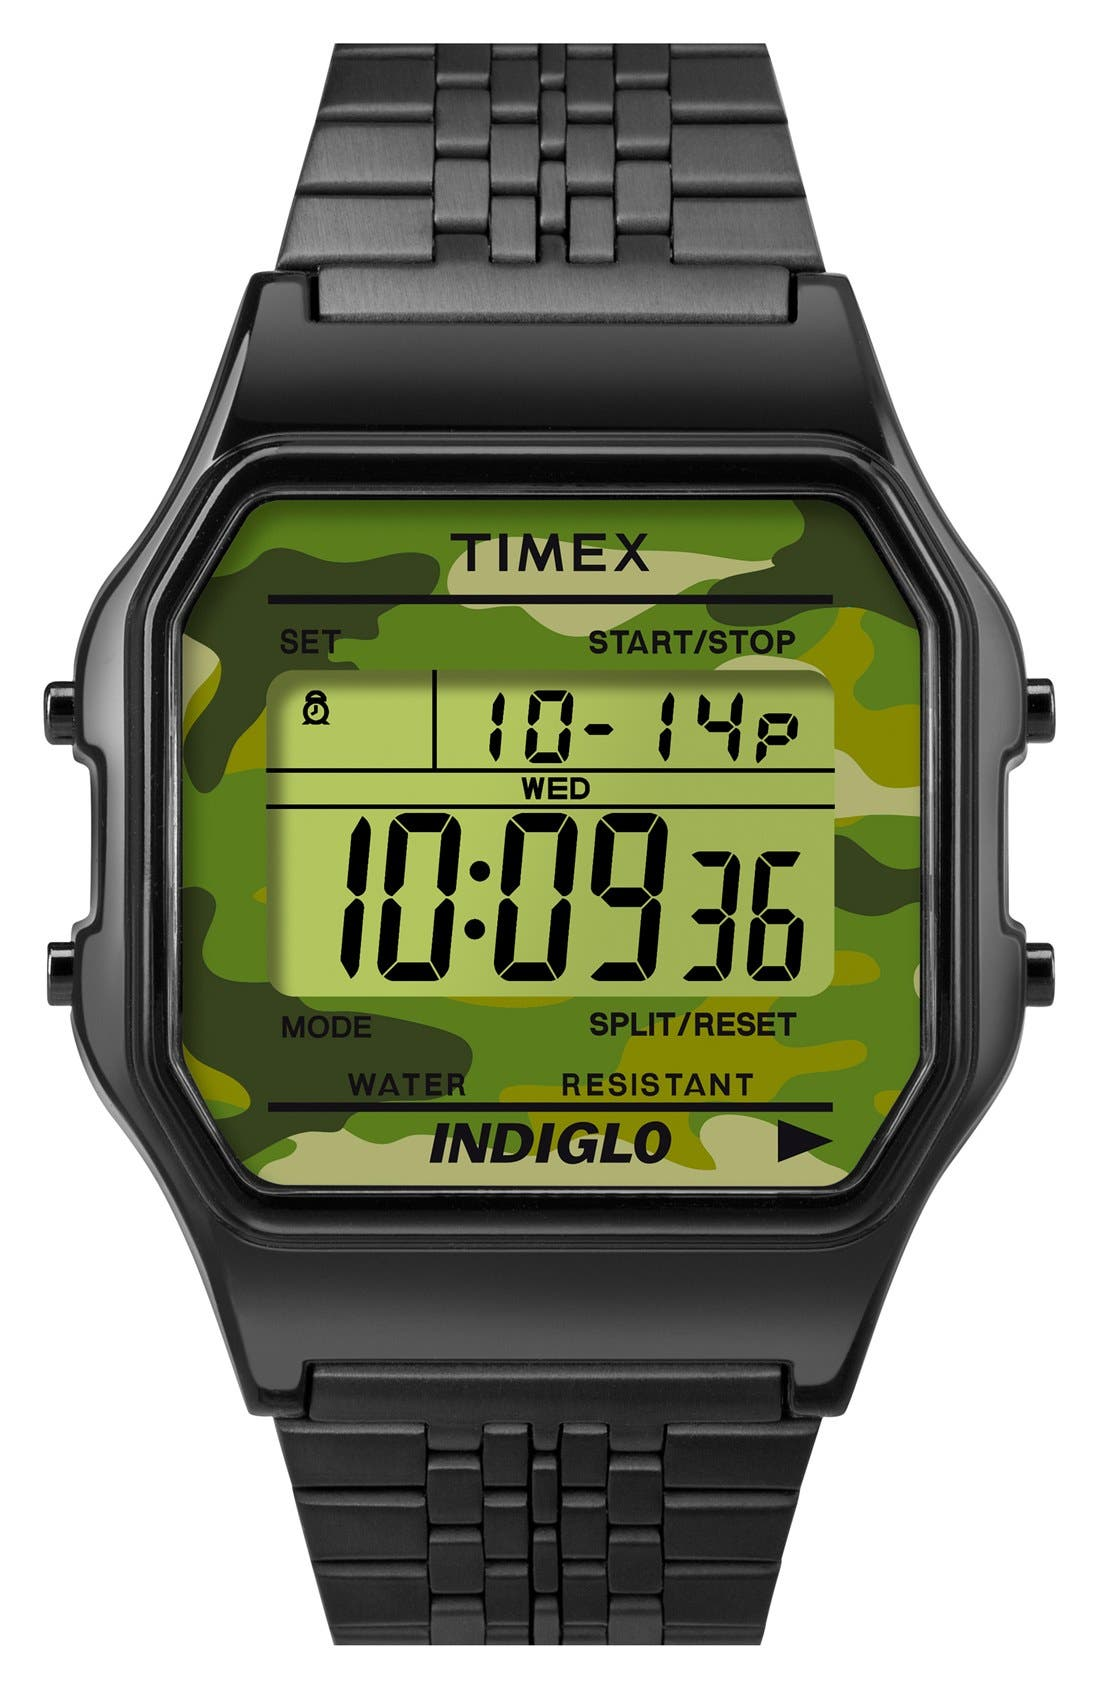 Timex 80 описание